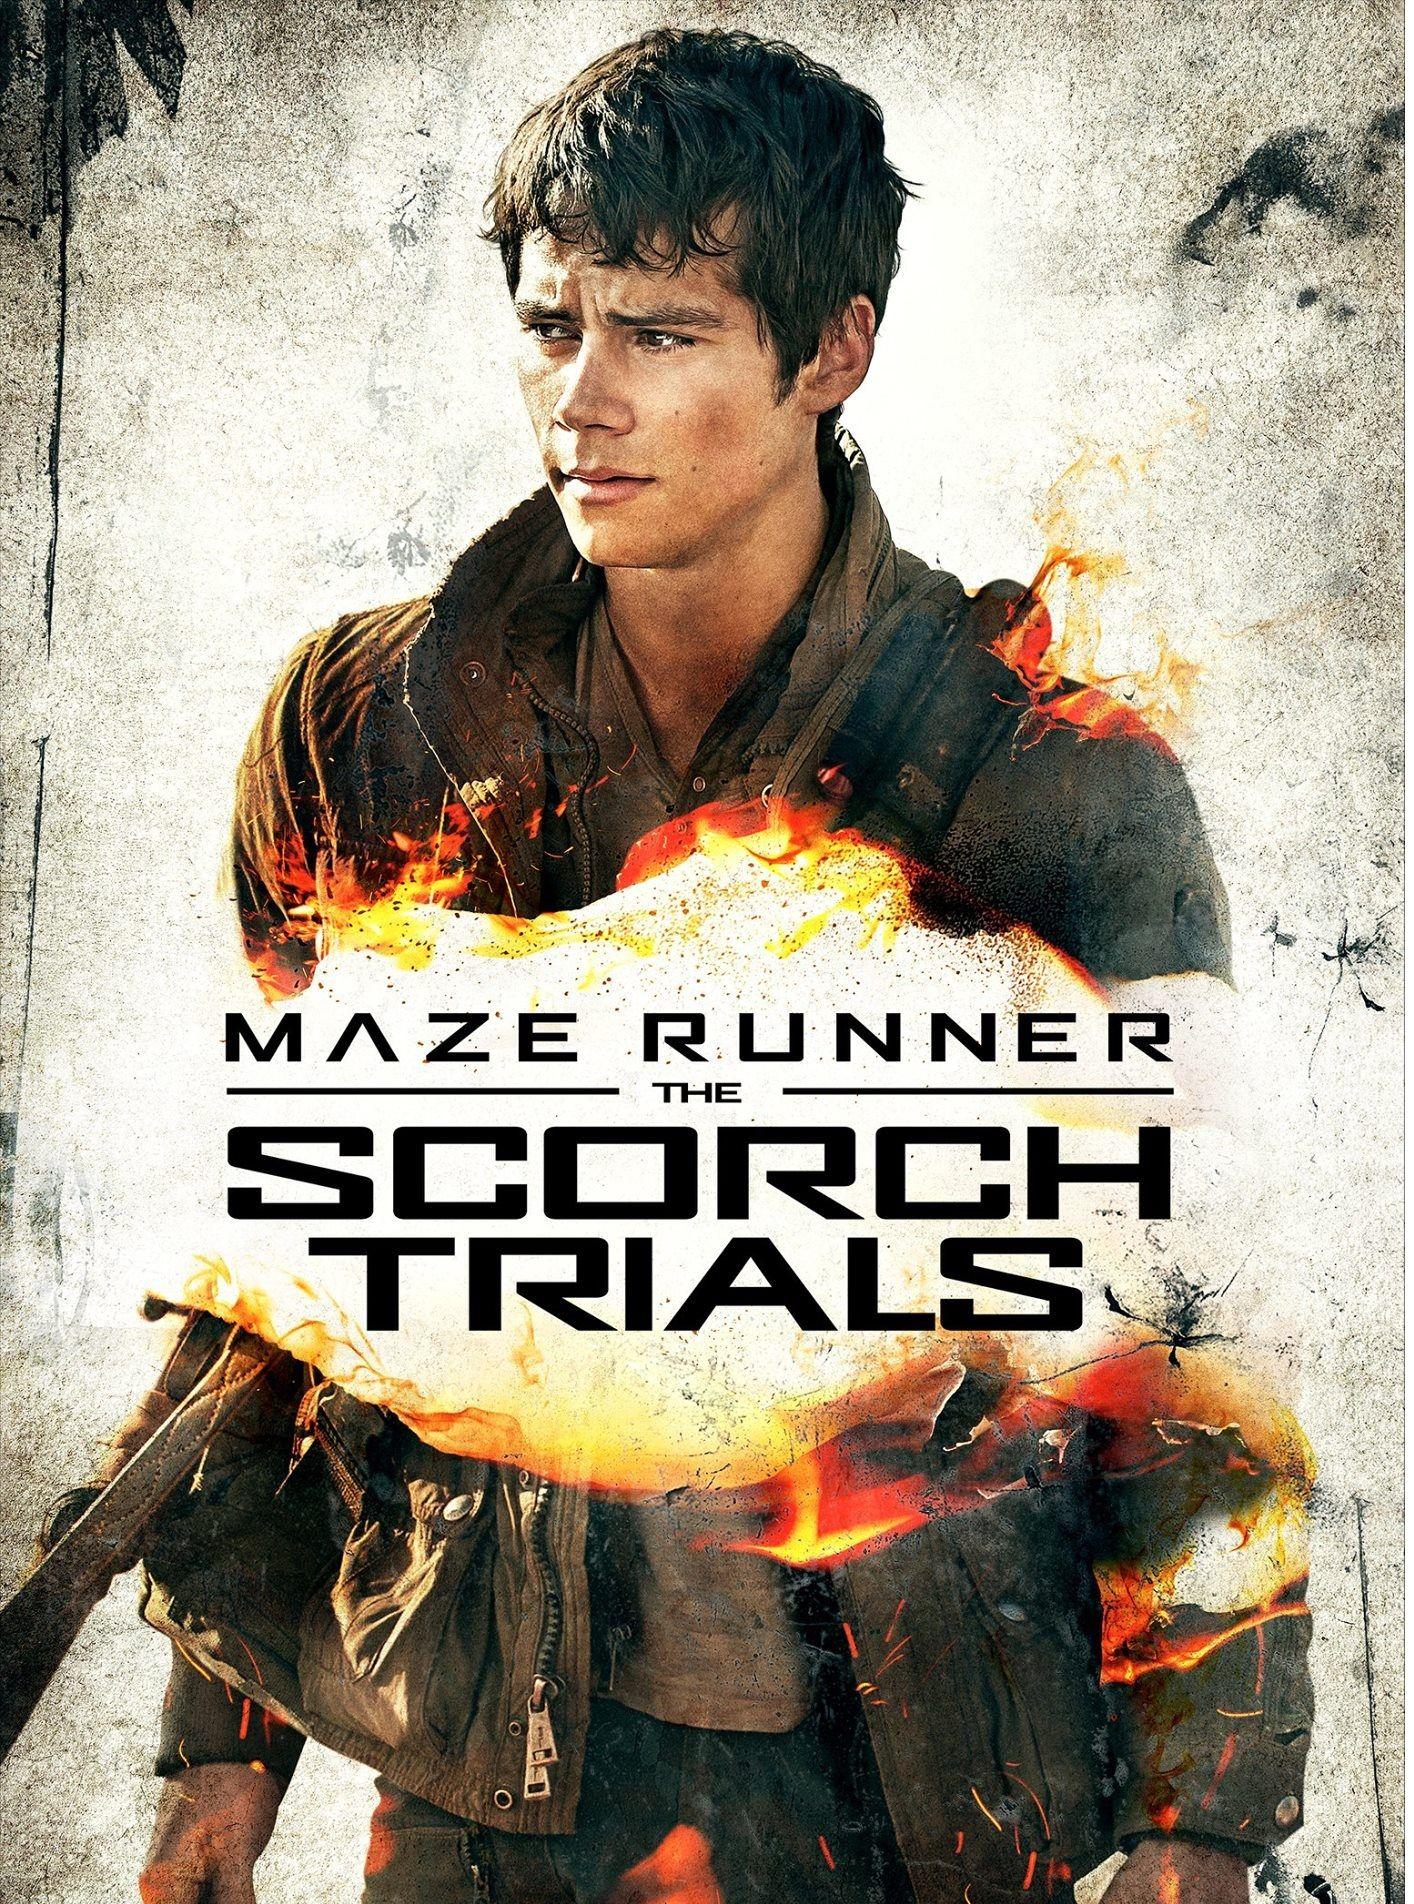 Movie Review On The Next Installment Of The Maze Runner Series, Maze Runner  Scorch Trials